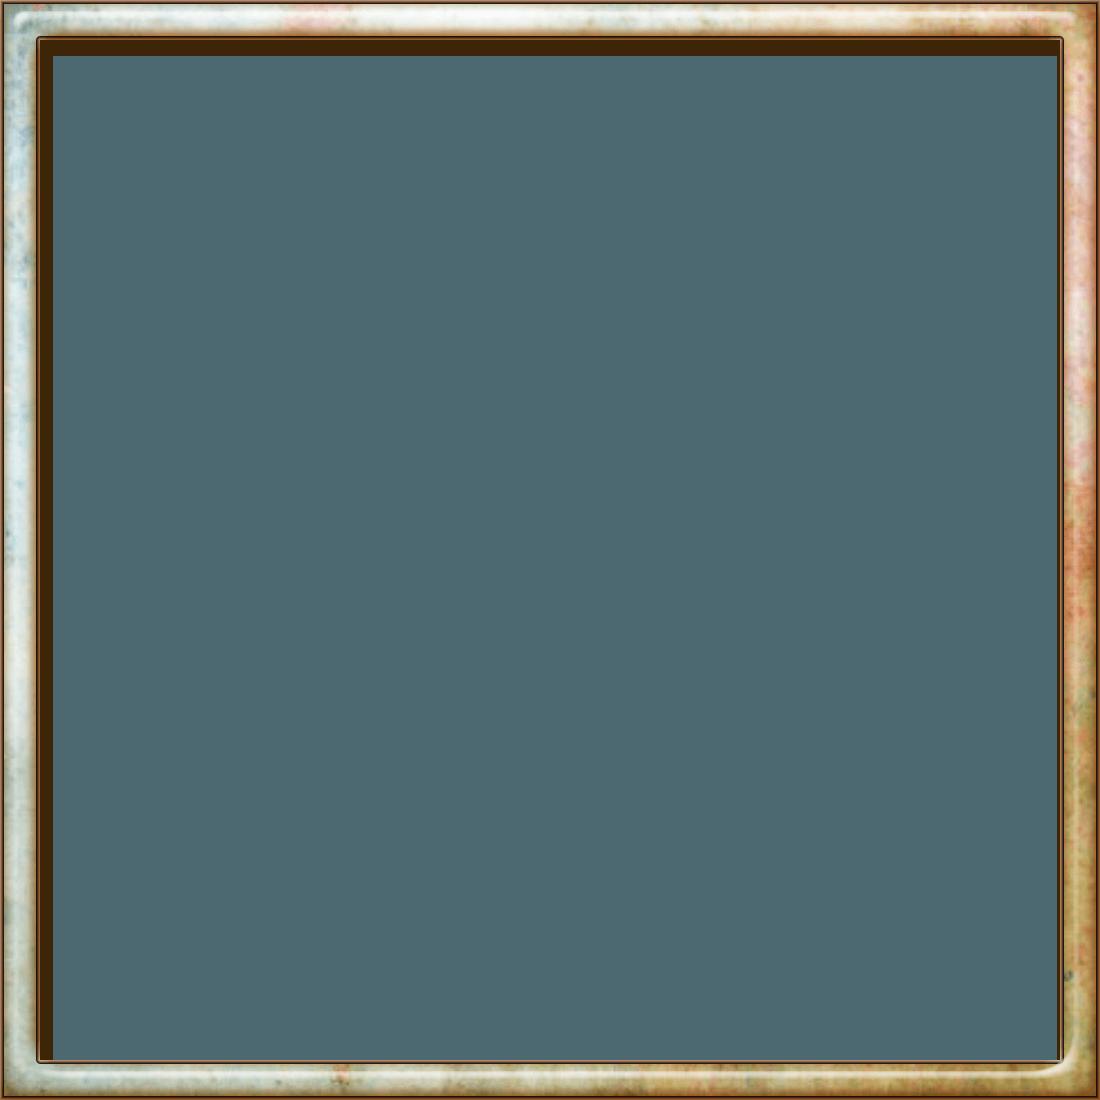 Square frame natural